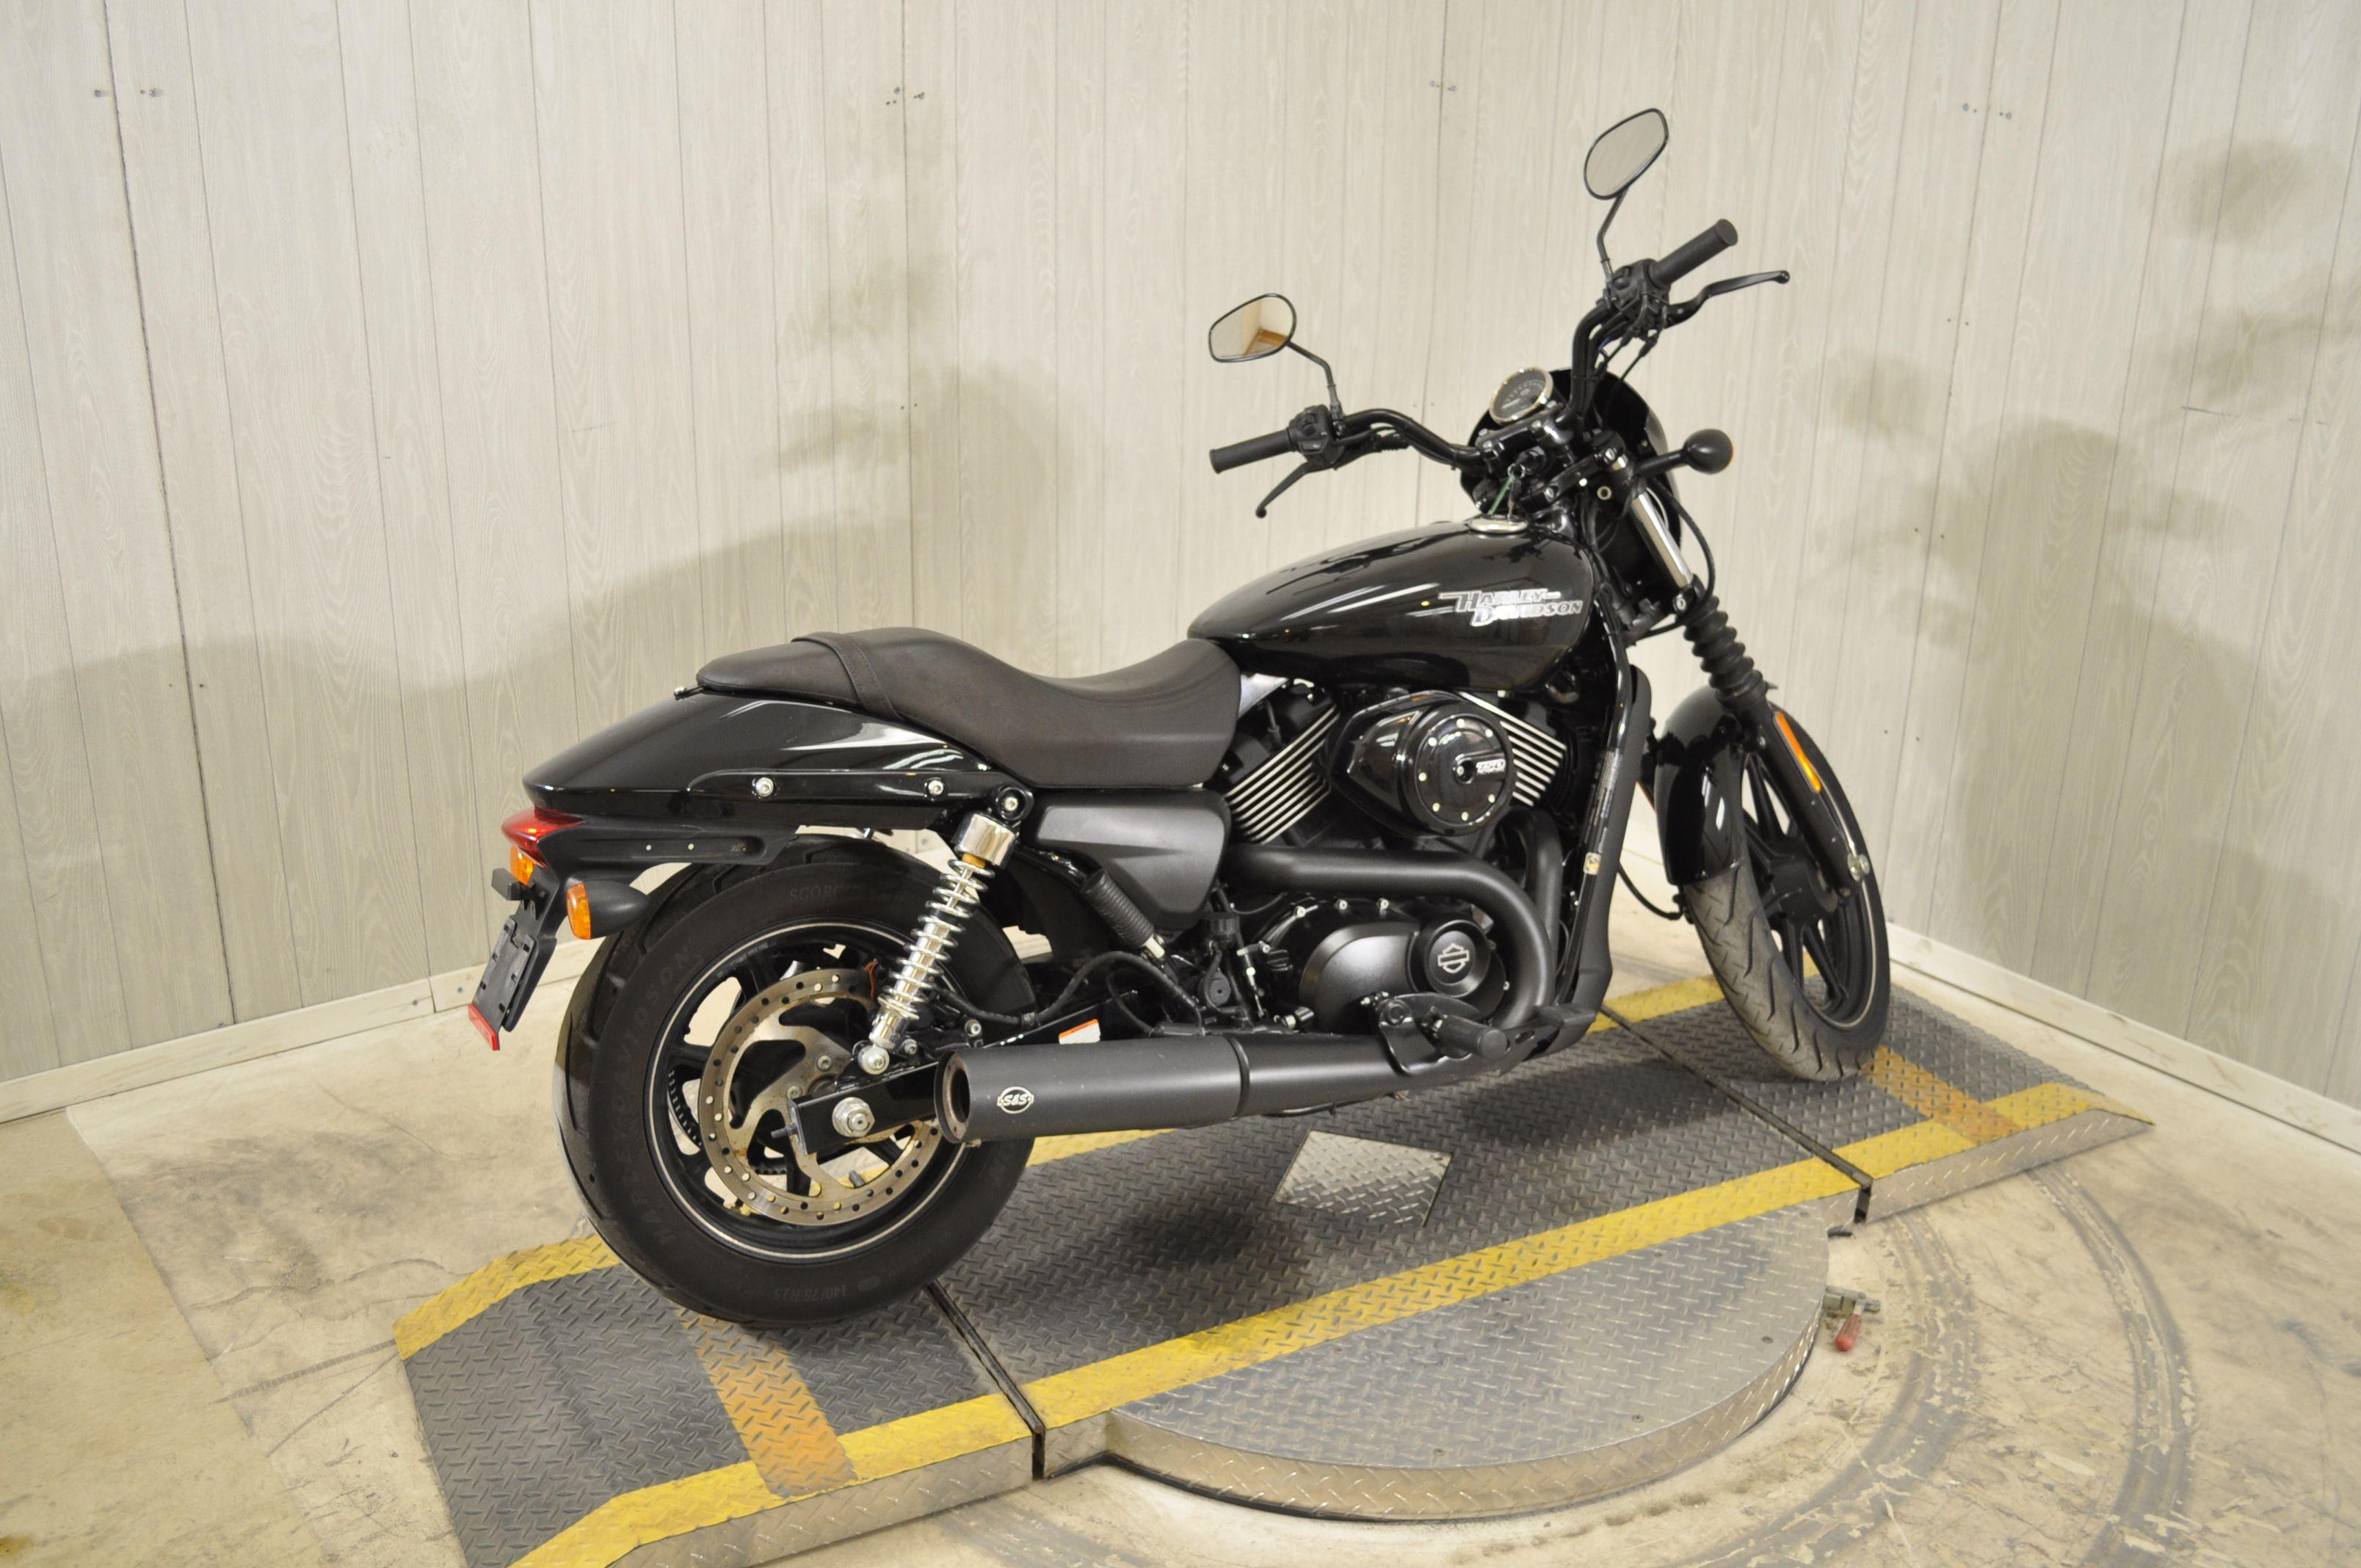 Pre-Owned 2019 Harley-Davidson Street 750 XG750